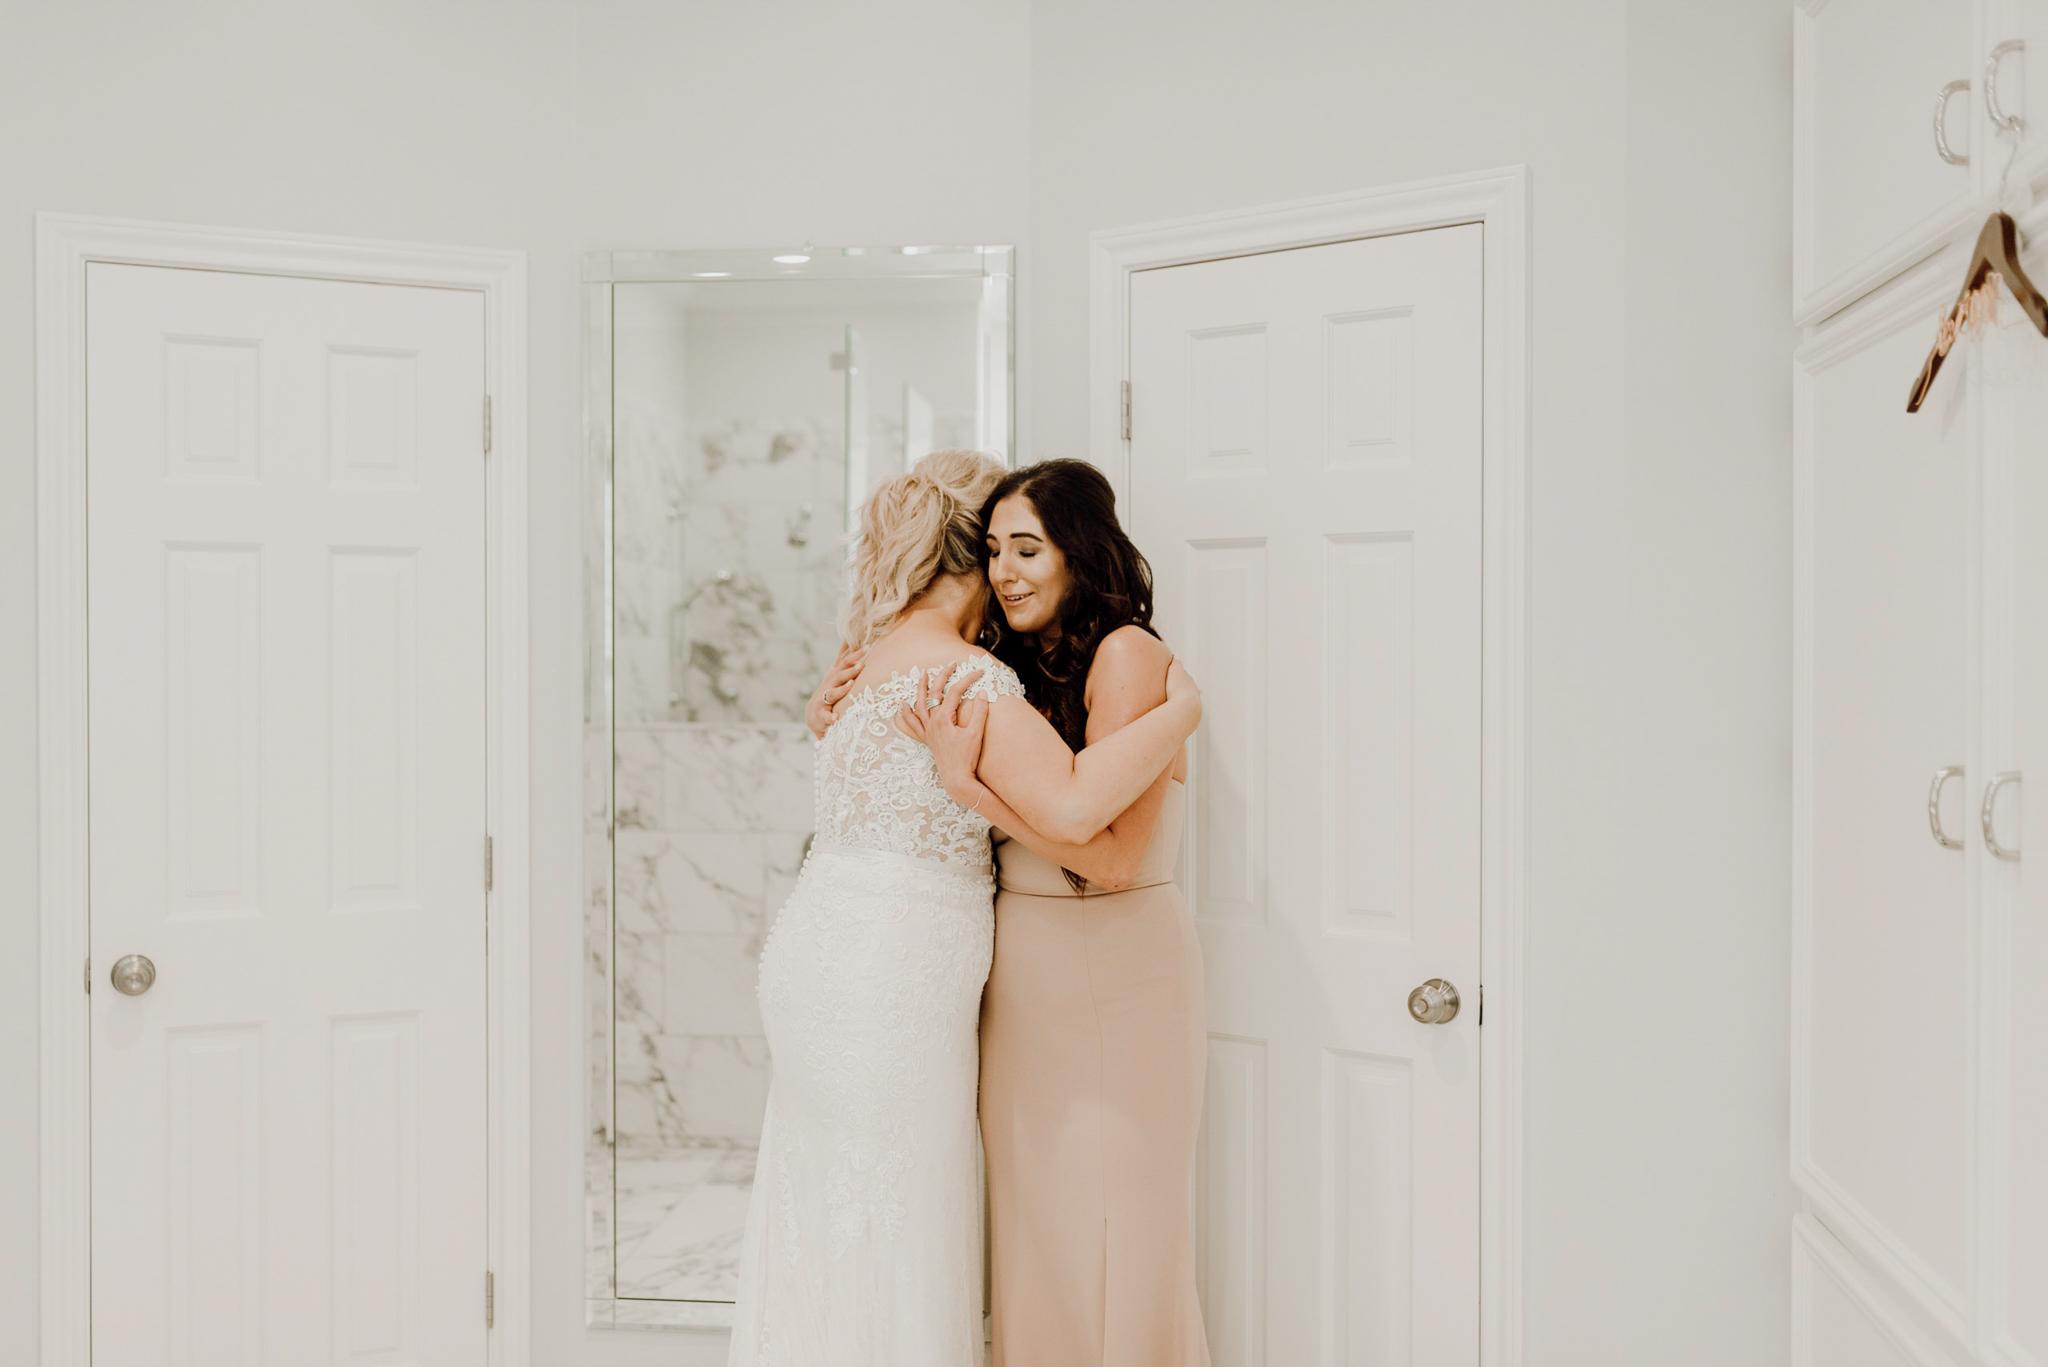 Houston Wedding Photographer-Intimate Texas Backyard Wedding- Houston Wedding Photographer -Kristen Giles Photography-26.jpg